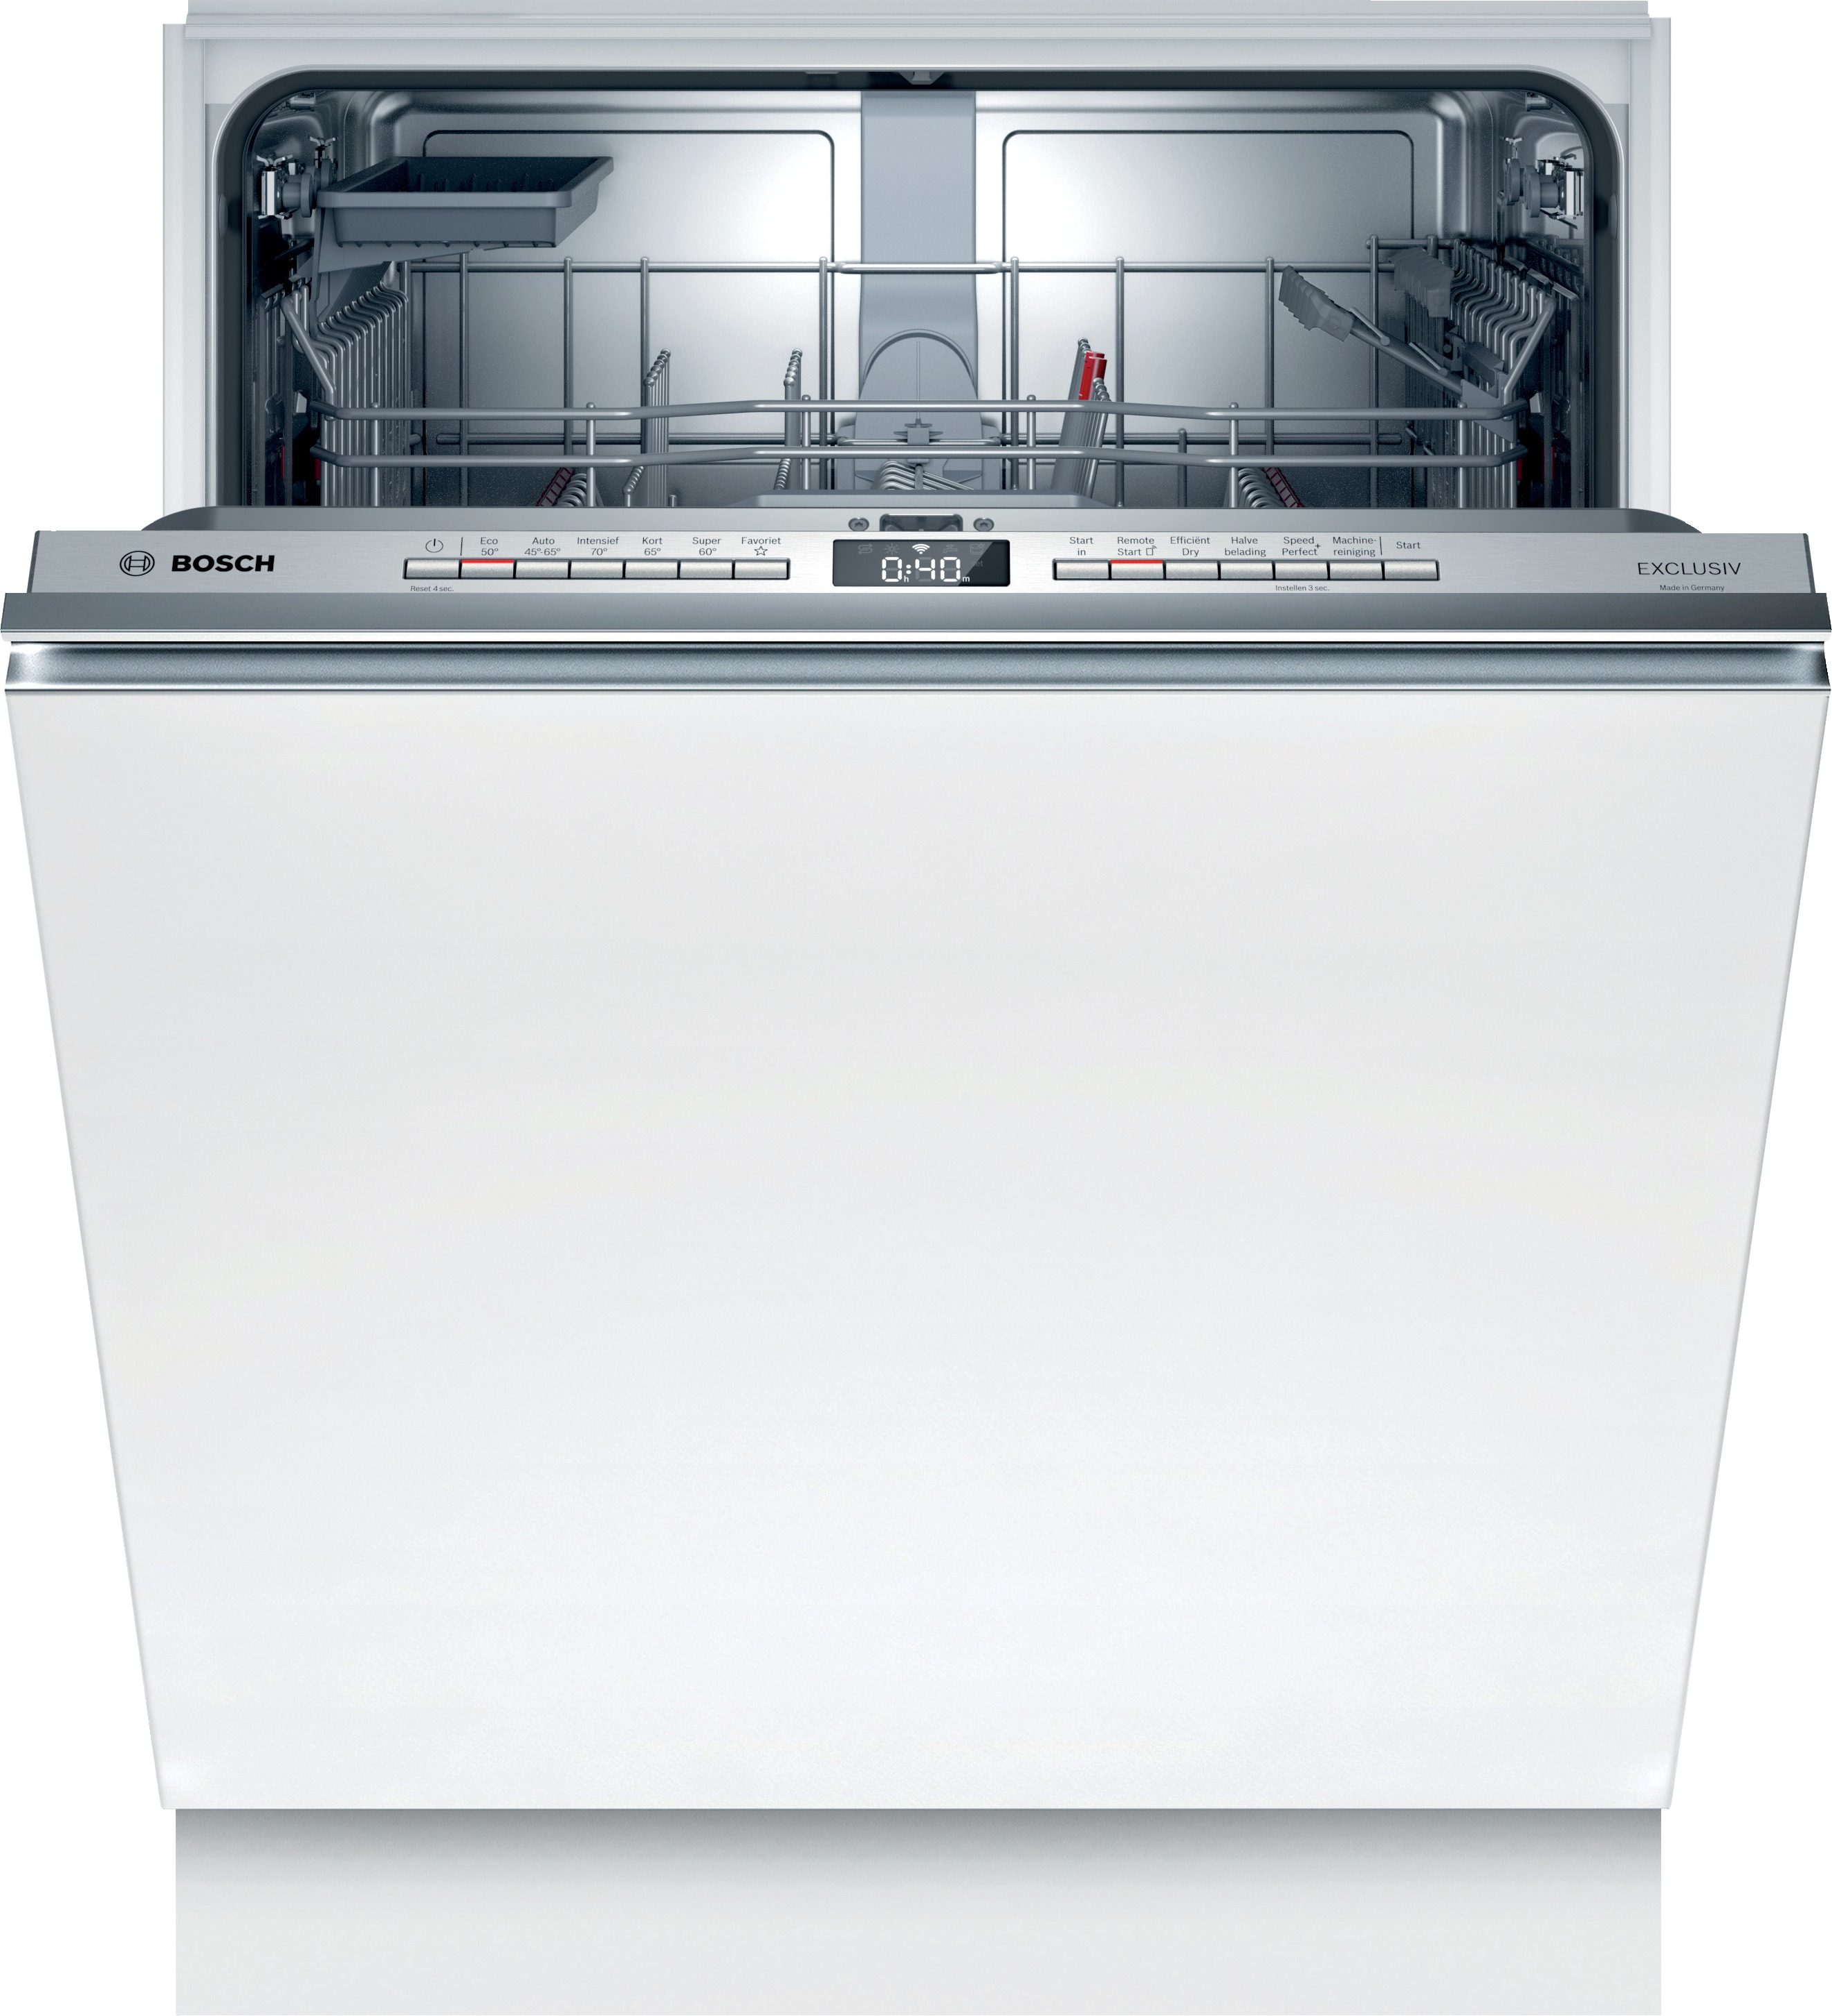 Bosch SMV4EBX00N Vaatwasser